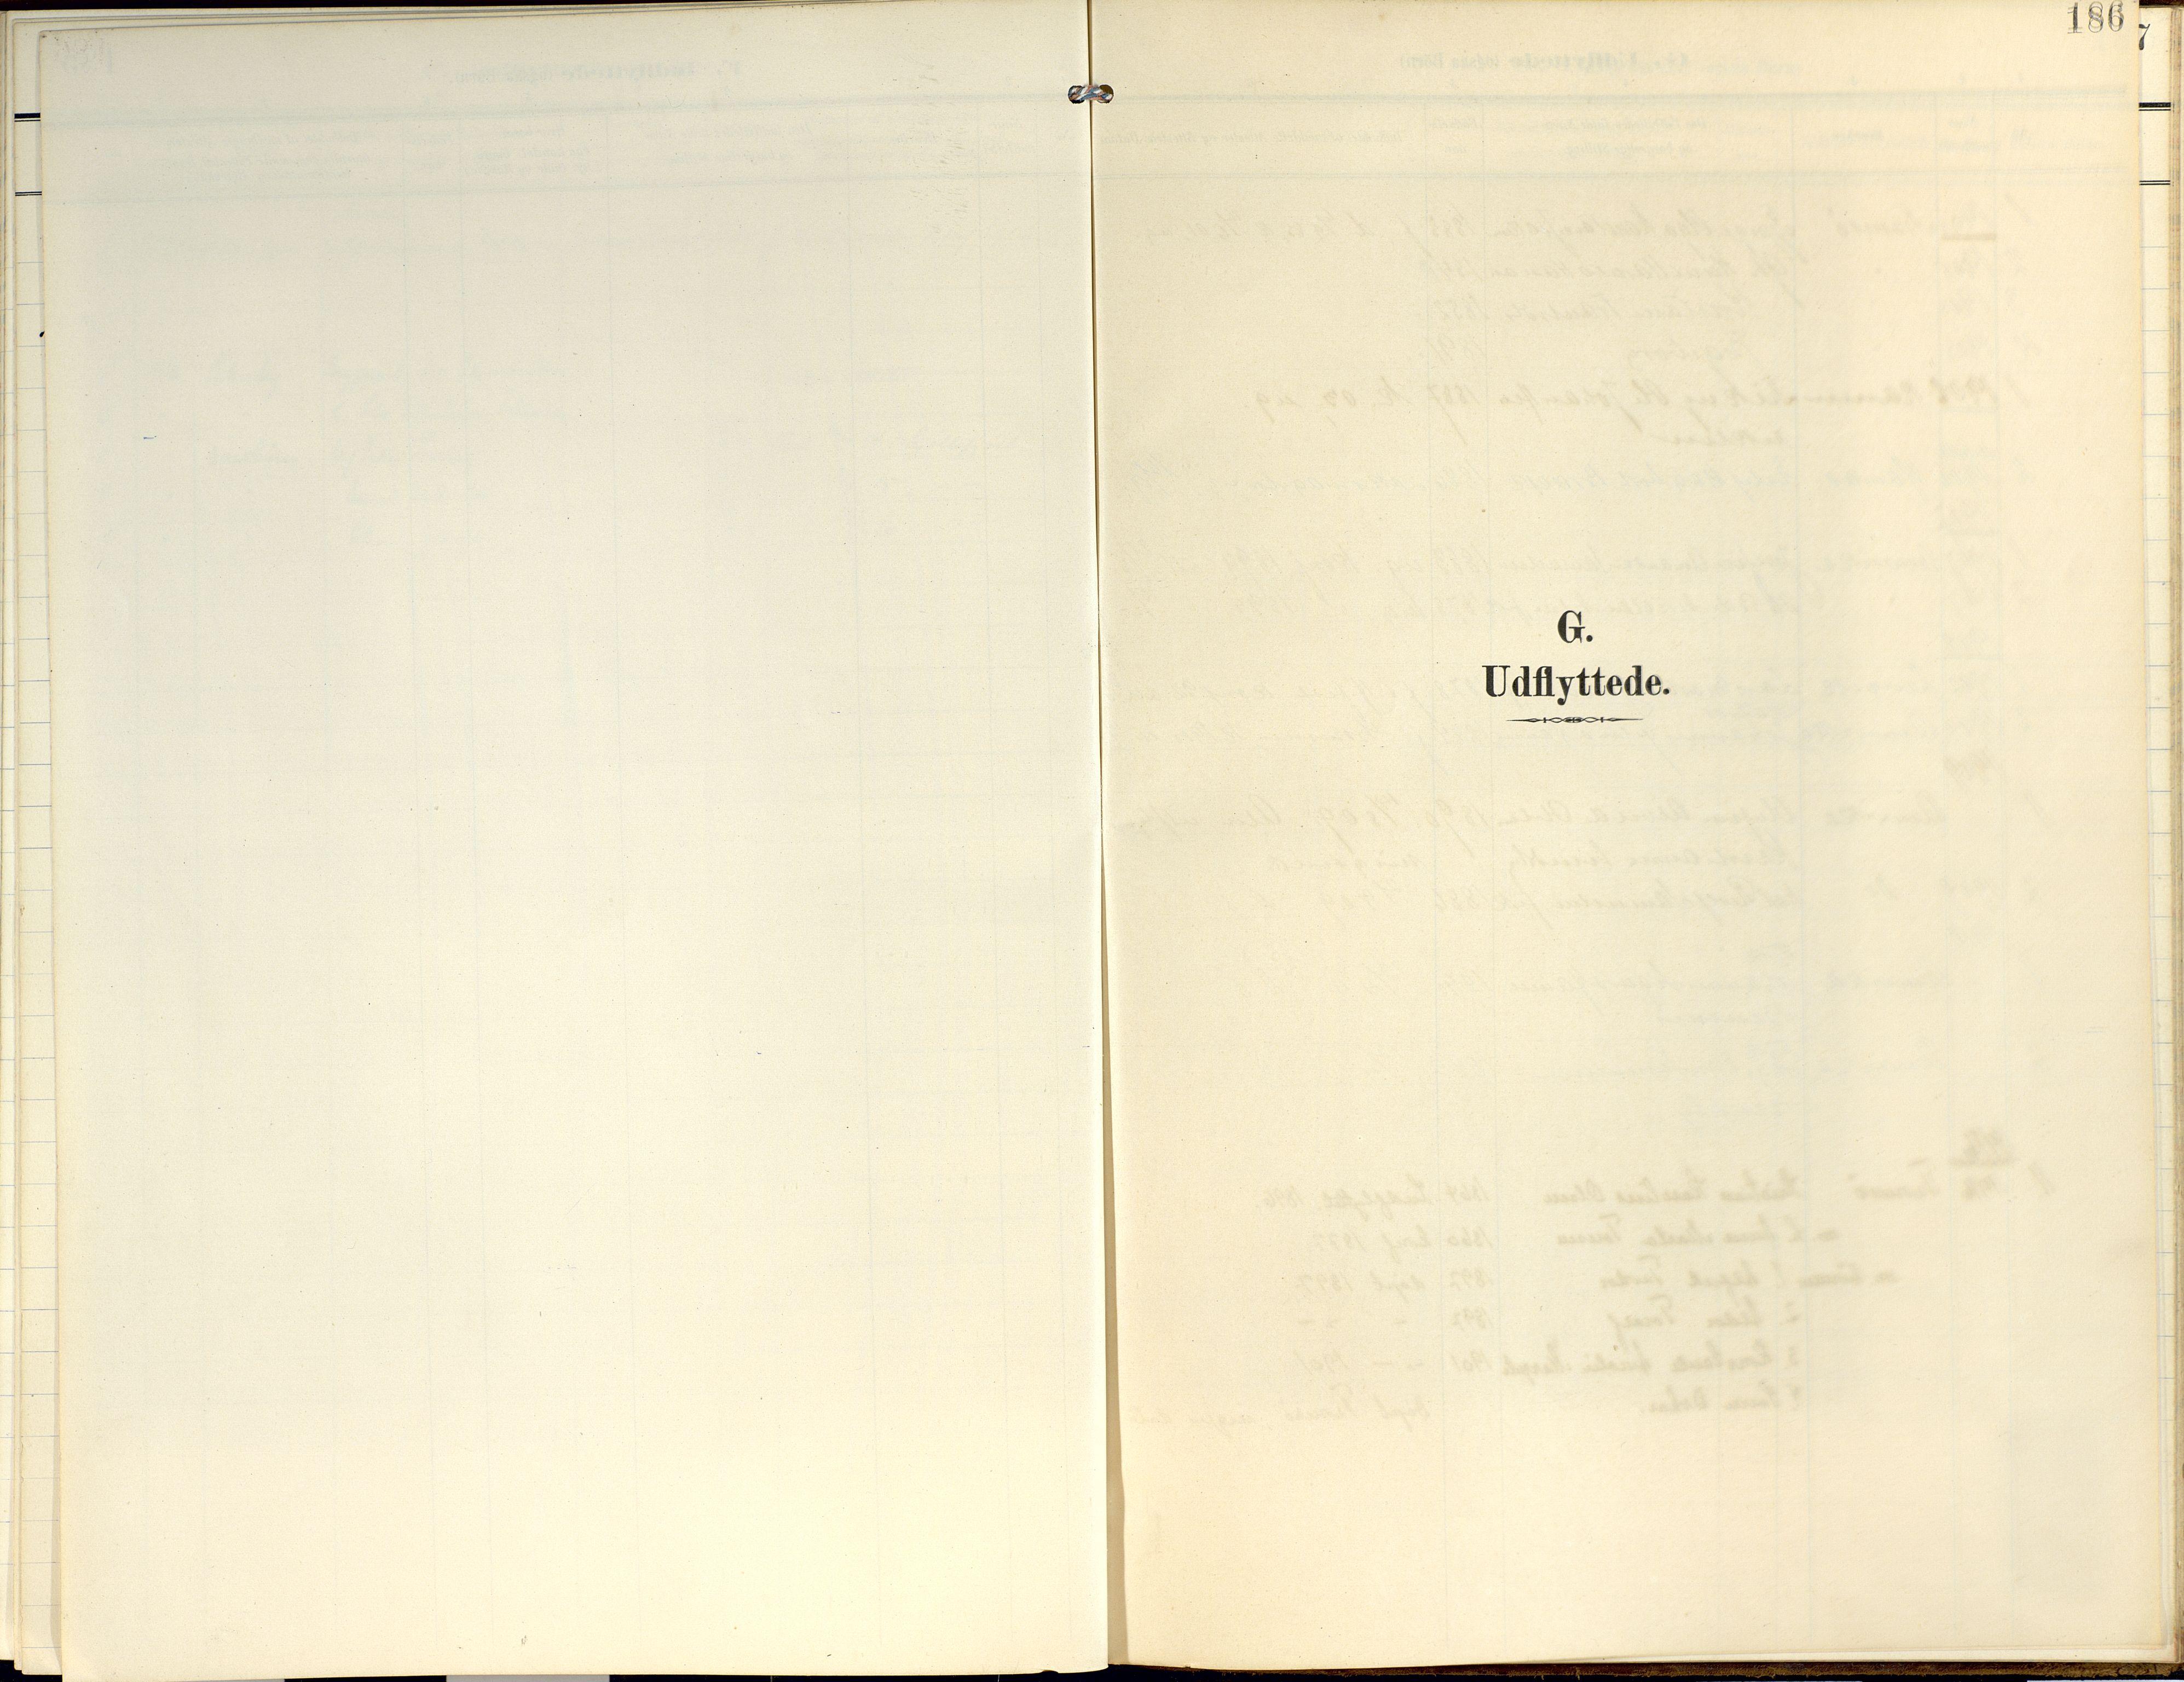 SATØ, Lyngen sokneprestembete, Ministerialbok nr. 14, 1905-1920, s. 186